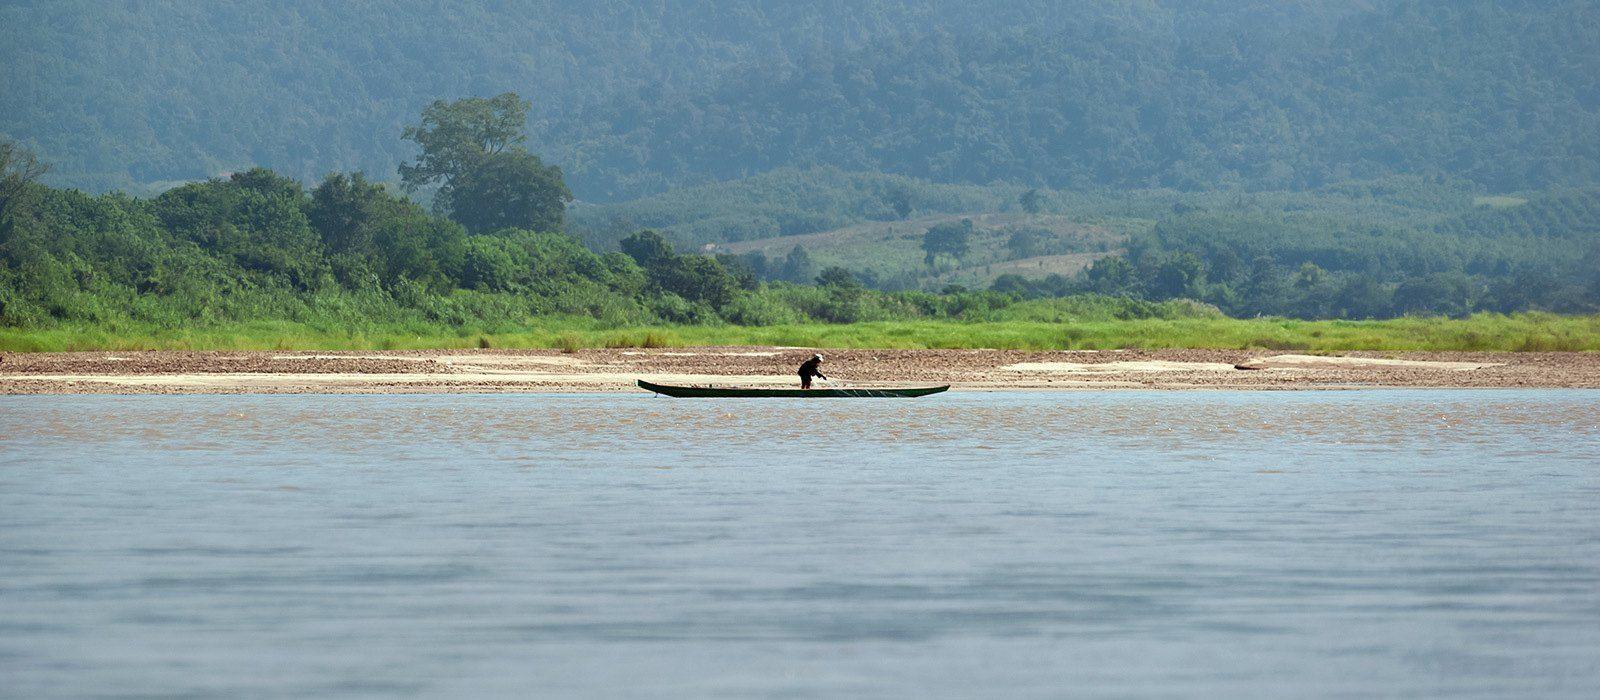 Destination Huay Xai / Mekong Thailand